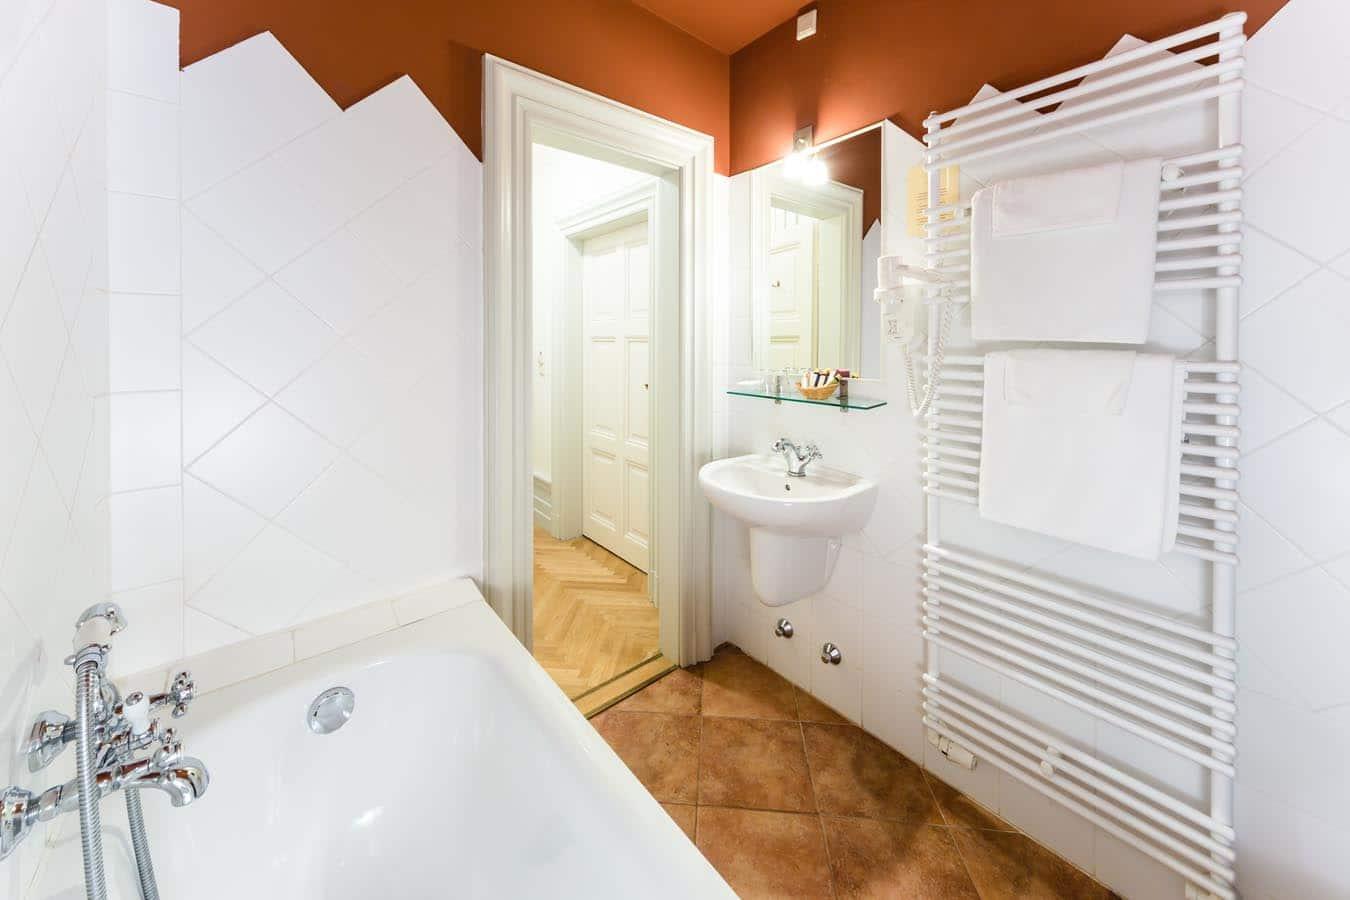 Pálfalvi Addiktológiai Centrum - fürdőszoba